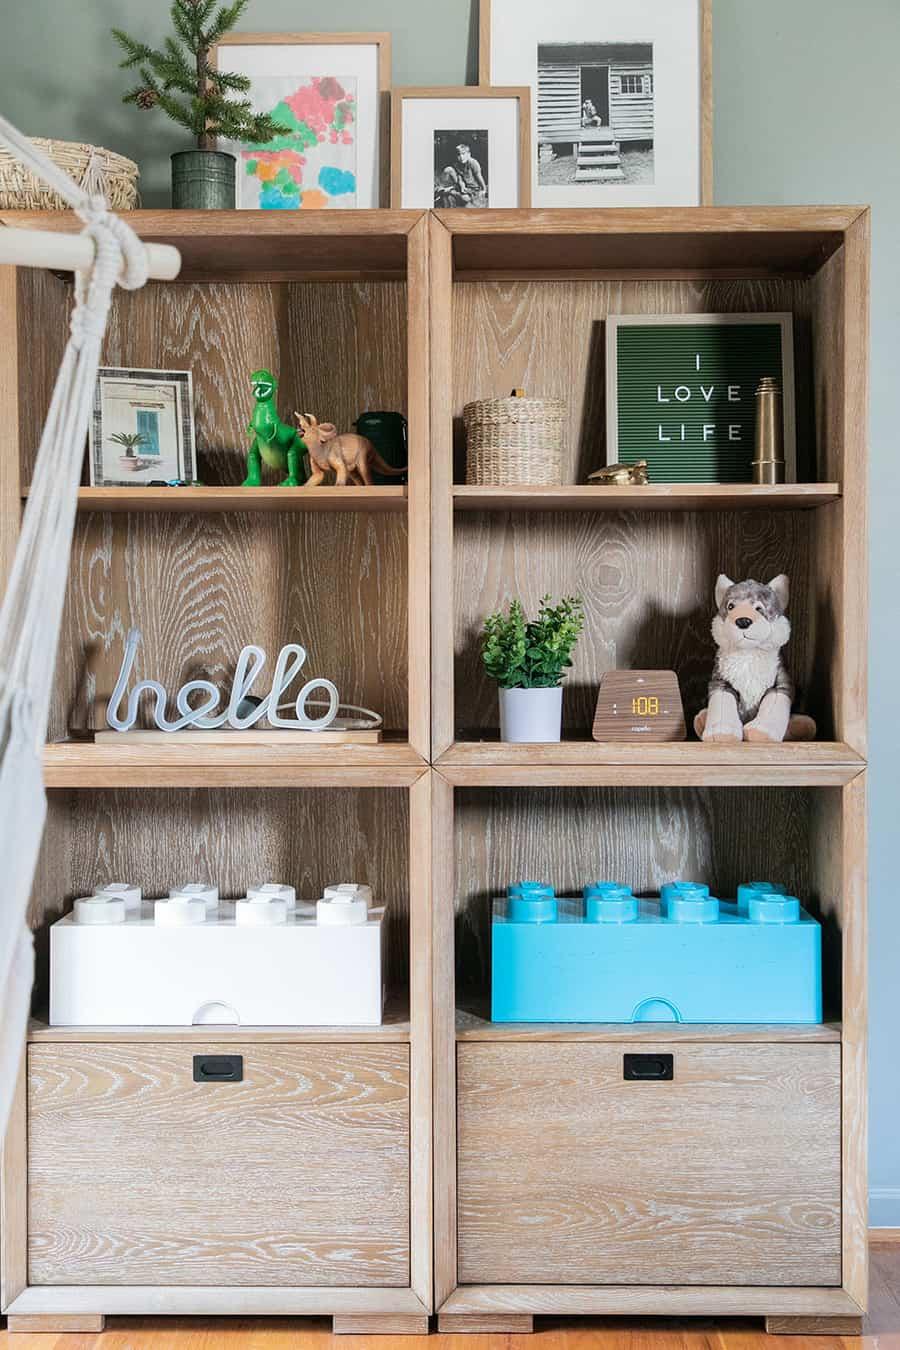 Book shelf with lego blocks in kids room